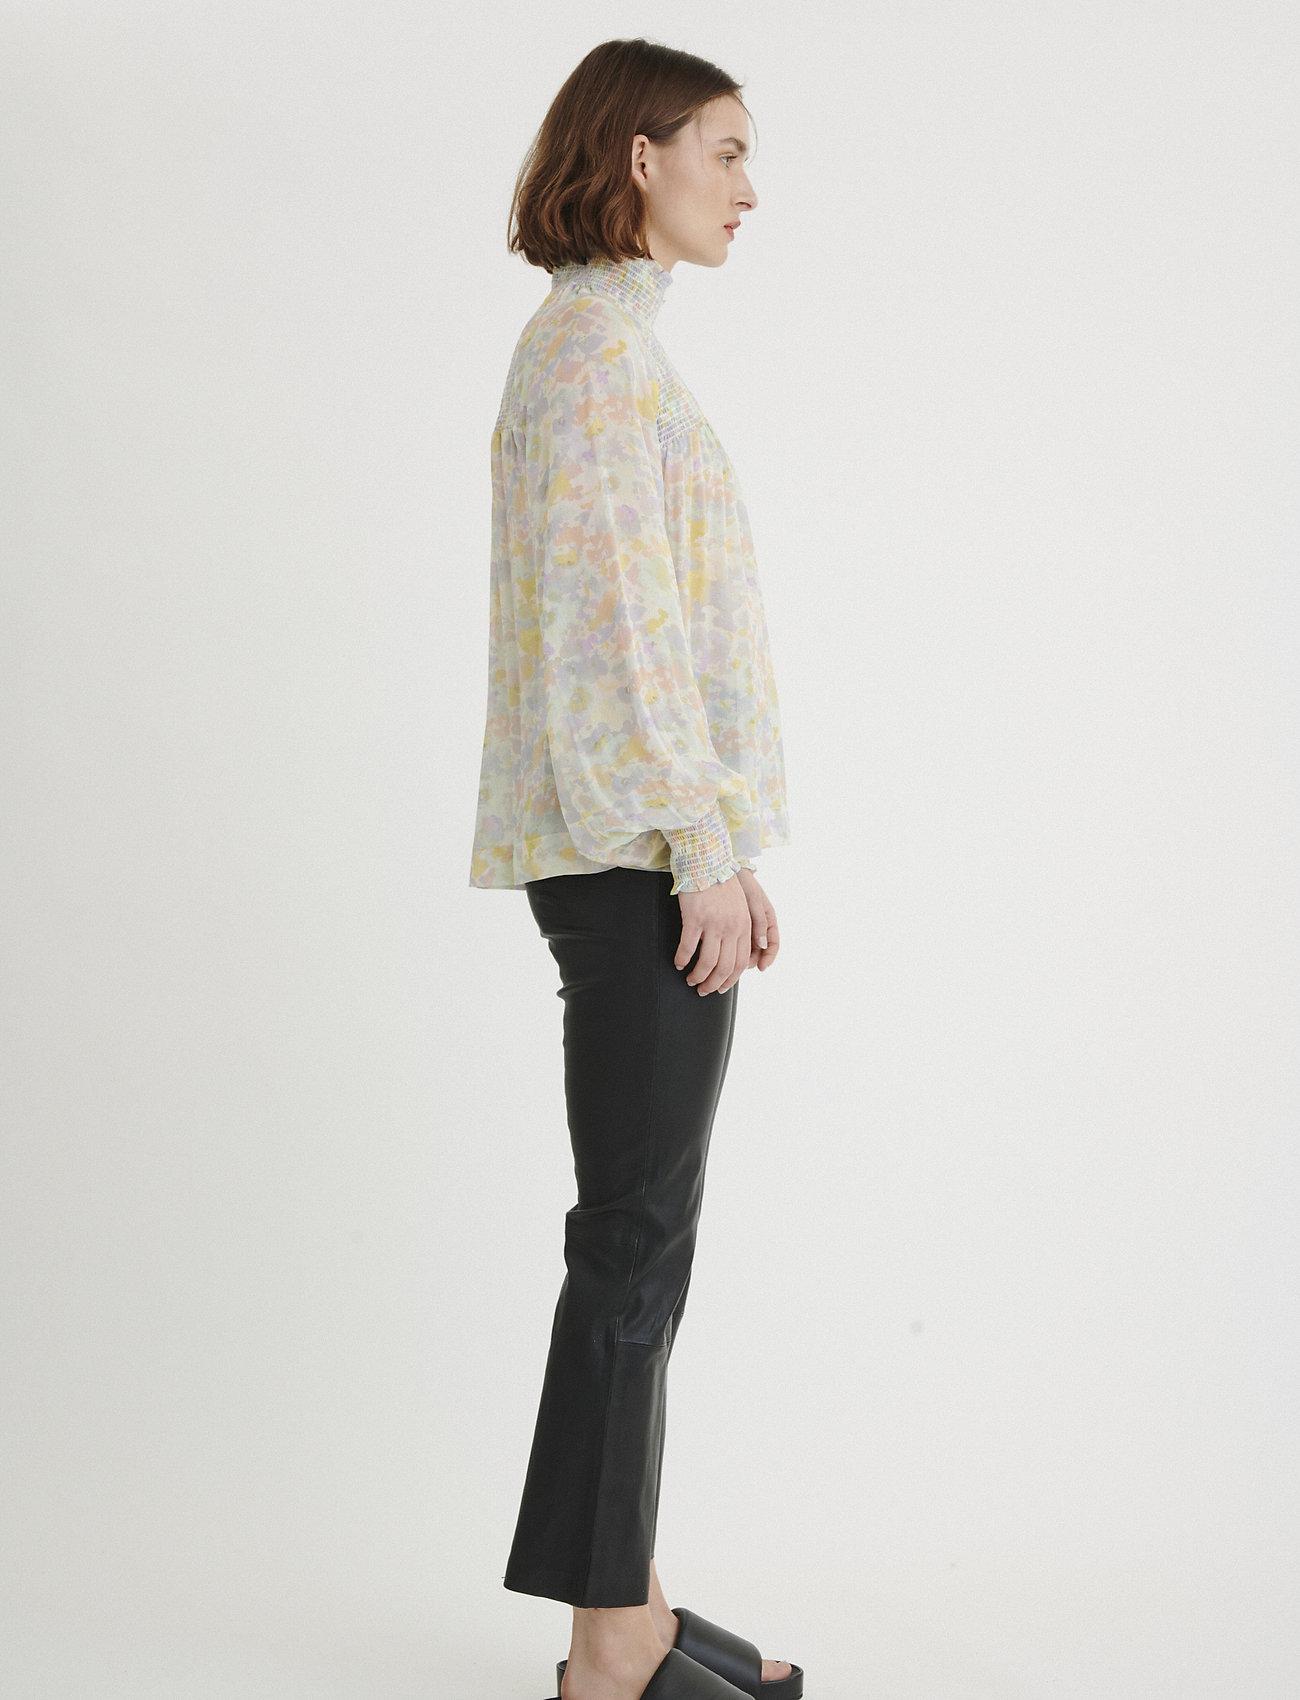 InWear Hayden Blouse - Bluser & Skjorter PASTEL WATERCOLOUR FLORALS - Dameklær Spesialtilbud